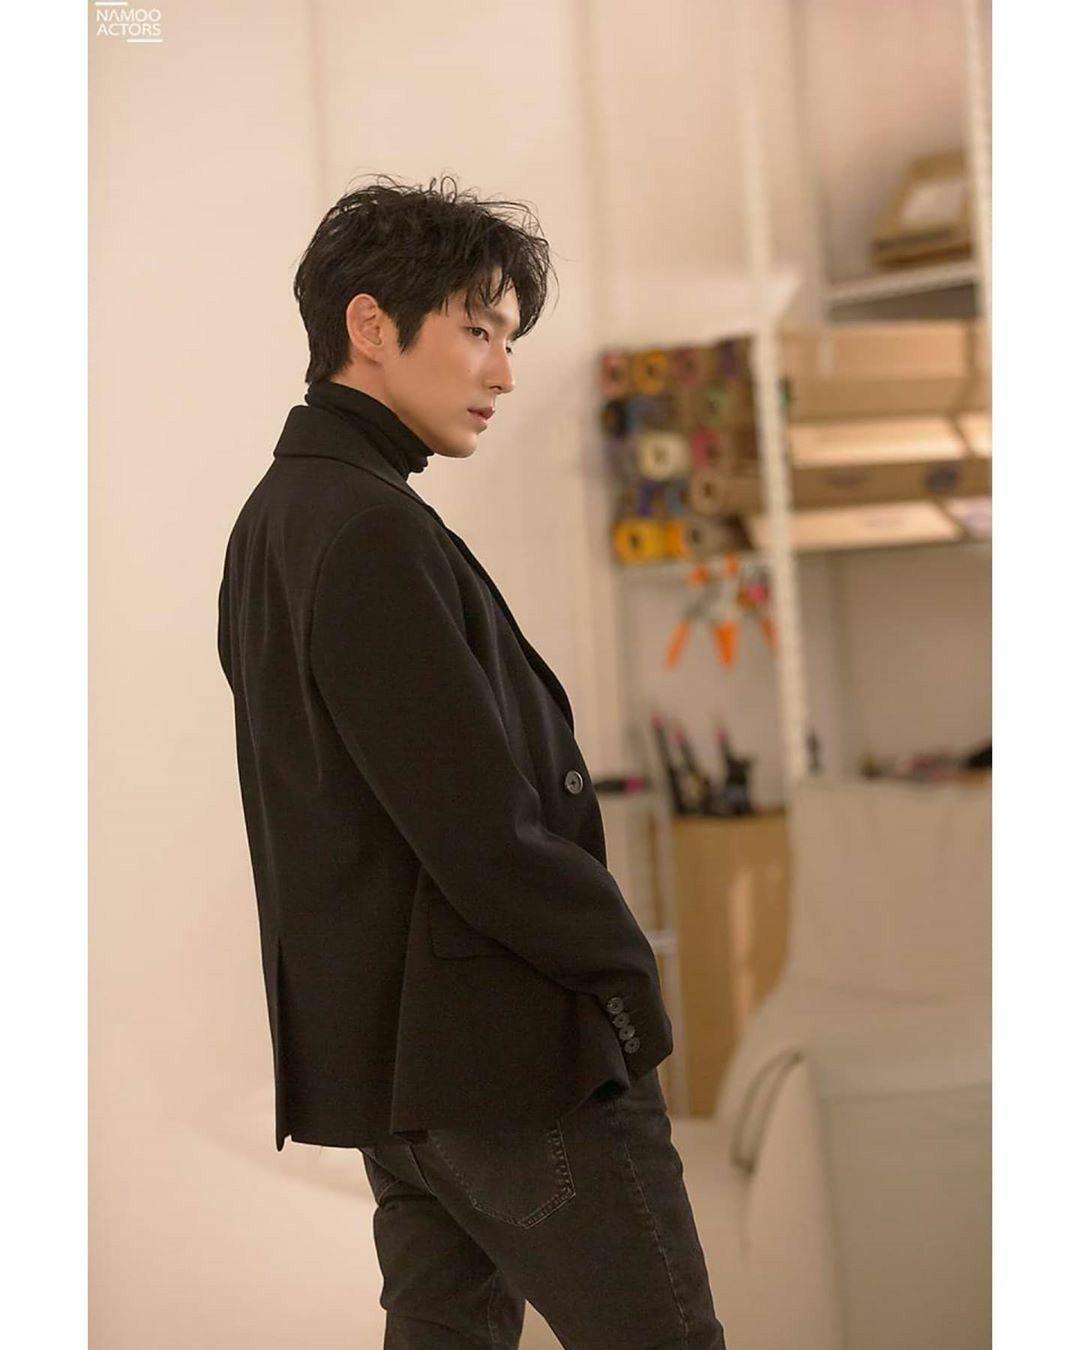 Pin di Yekojks jk su @actor_jg Lee Joon gi ️ nel 2020